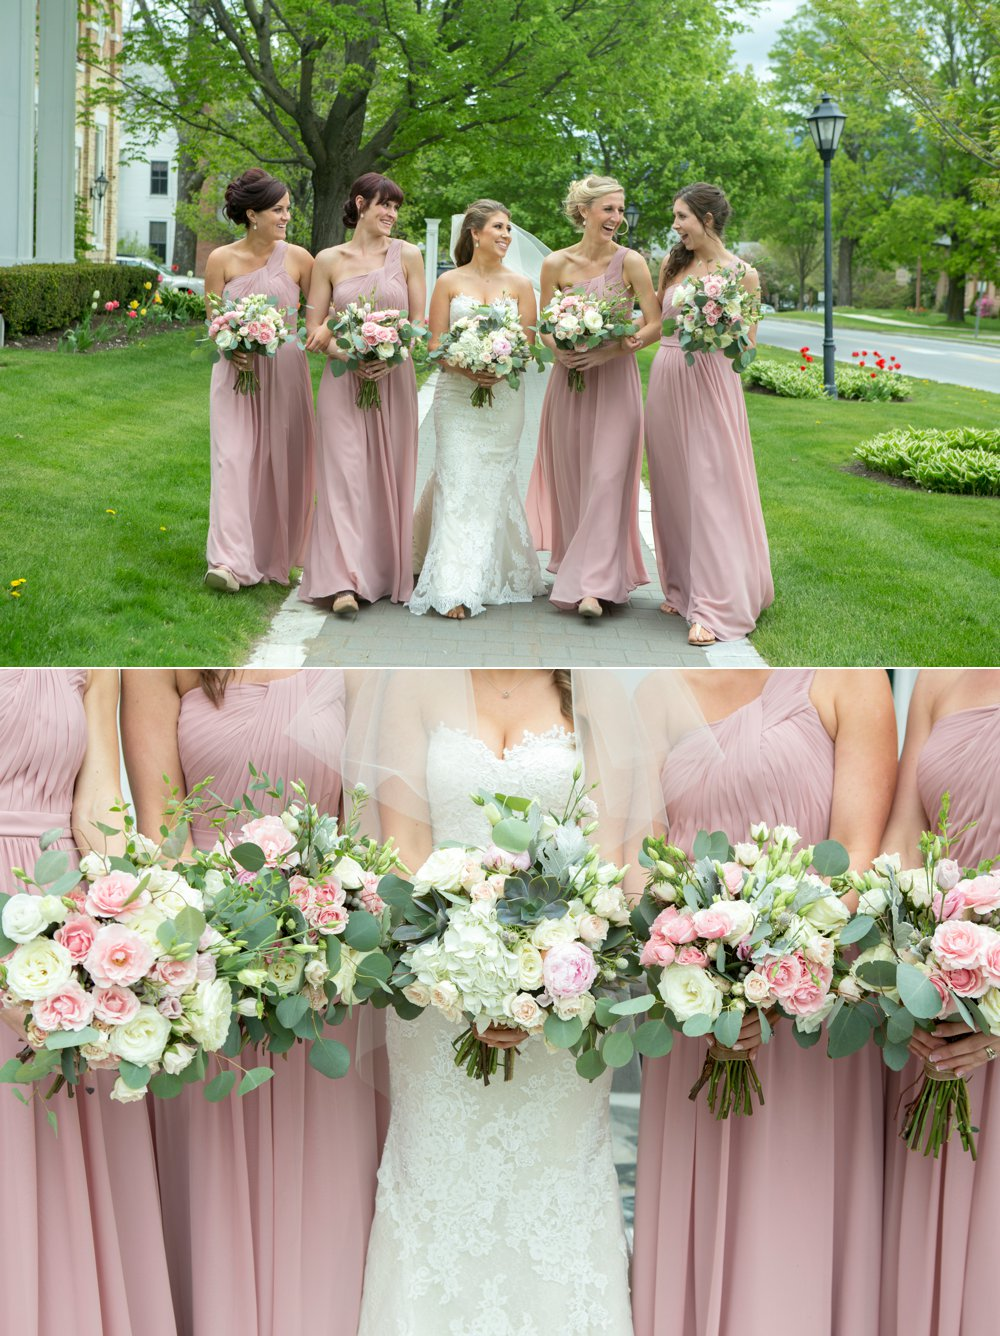 SomerbyJonesPhotography_EquinoxVermont_Wedding_0014.jpg